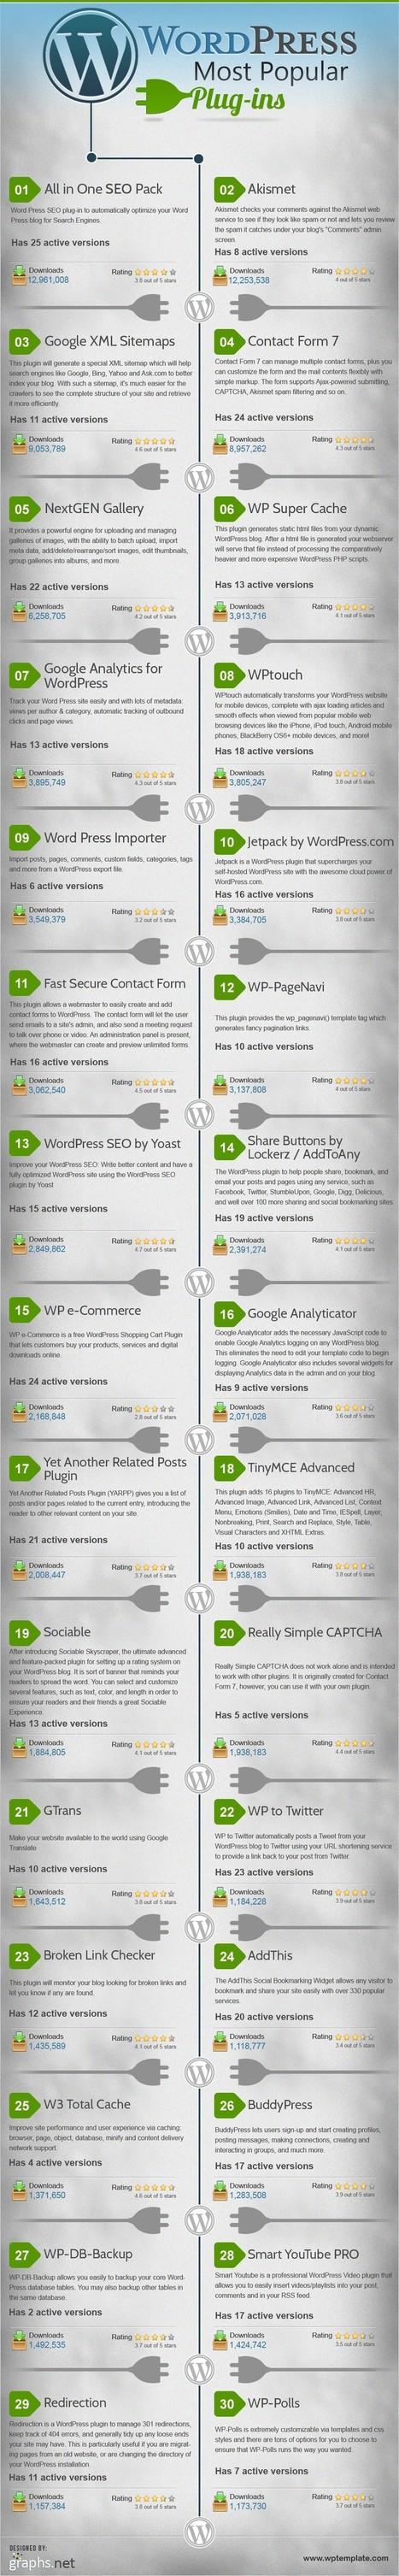 Top 30 Best & Most Popular WordPress Plugins - Infographics   Viral Classified News   Scoop.it